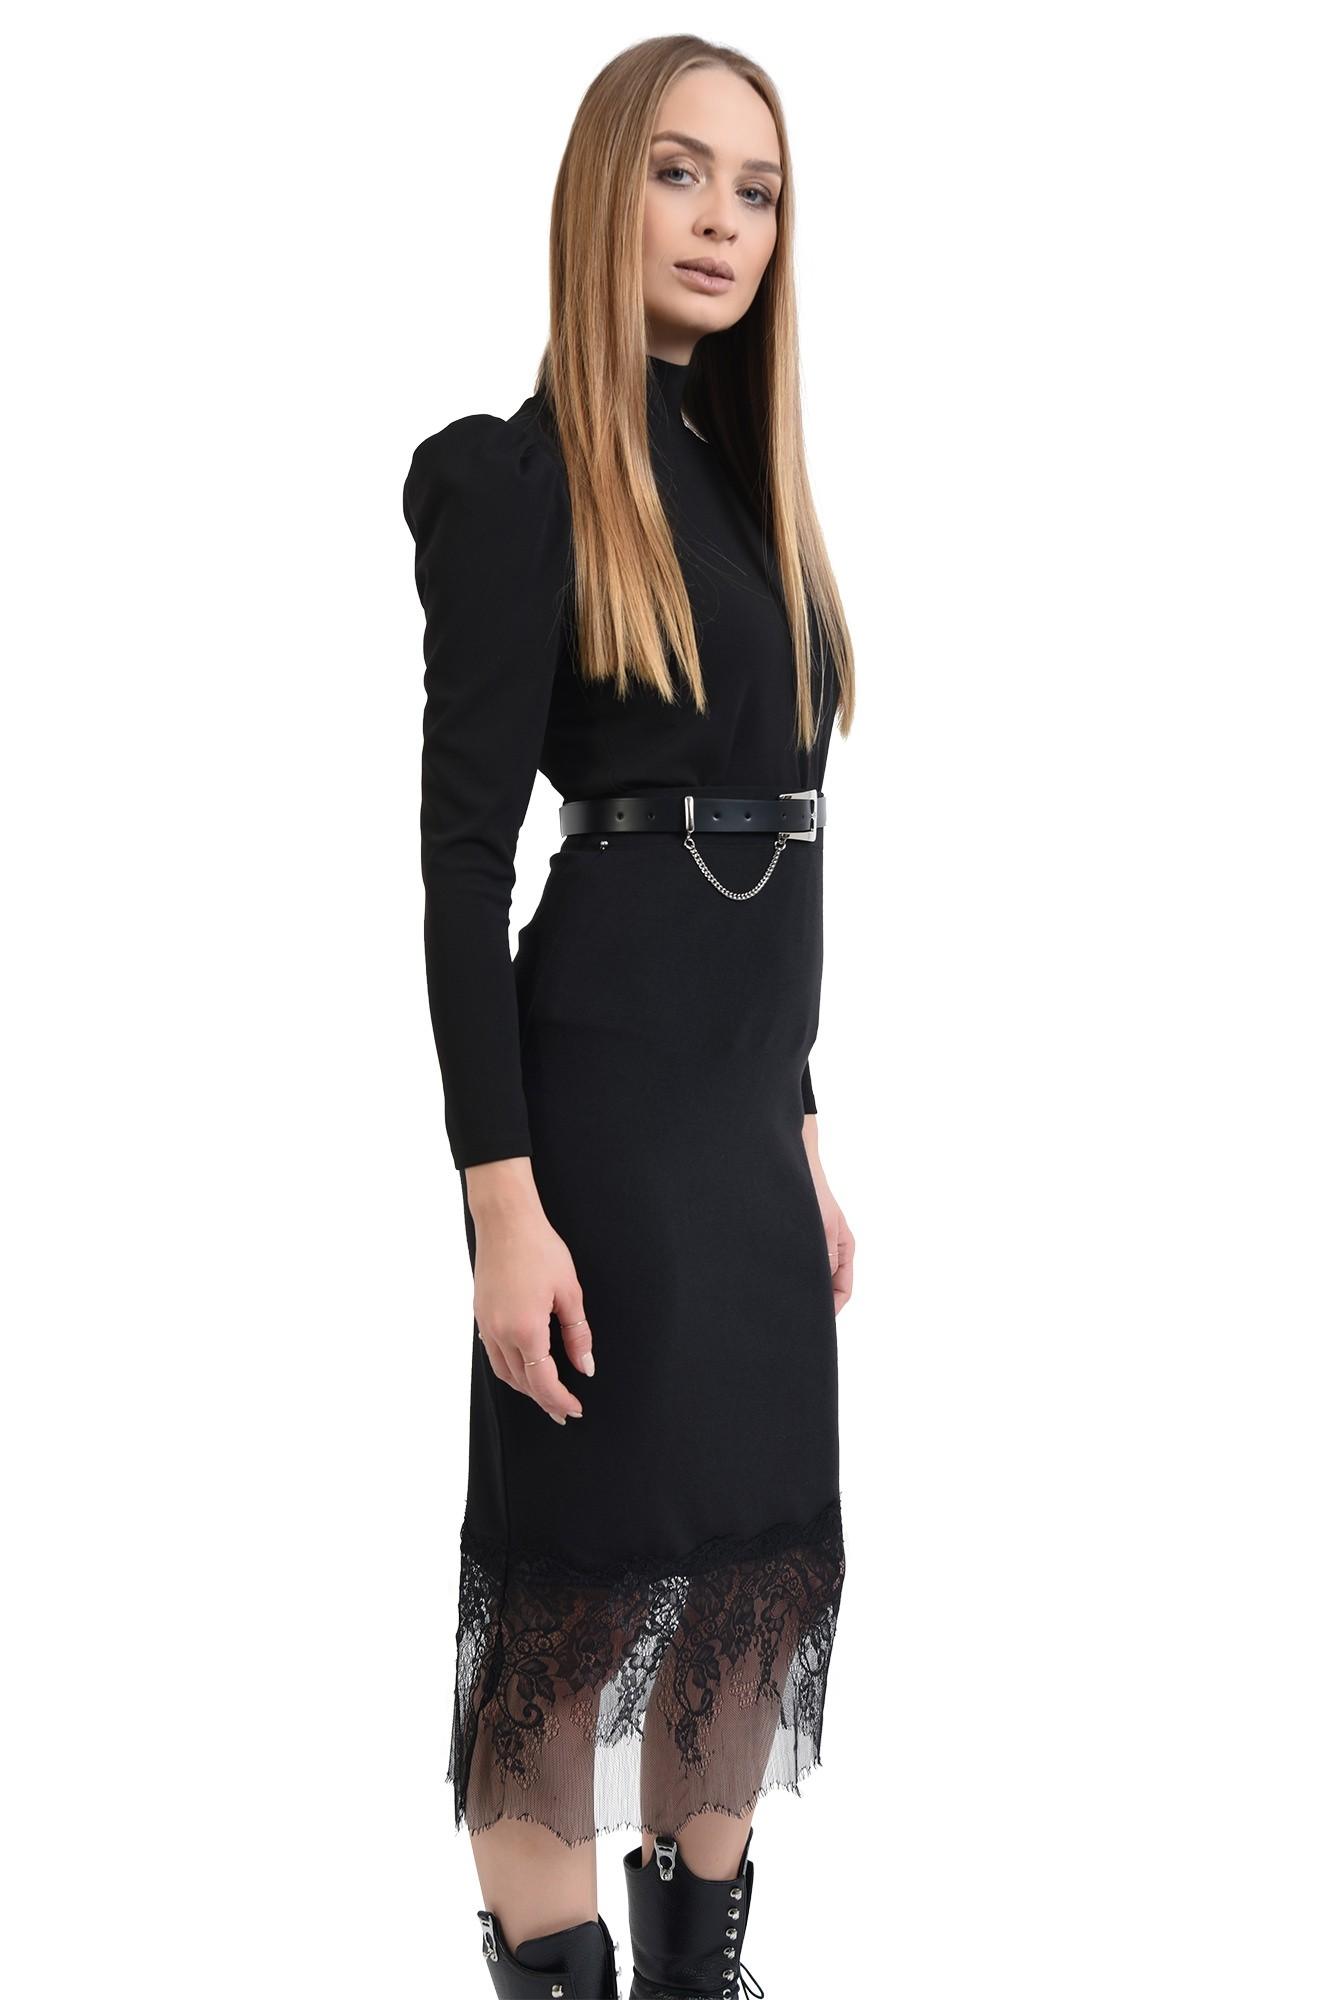 3 - 360 - fusta neagra, midi, cu talie inalta